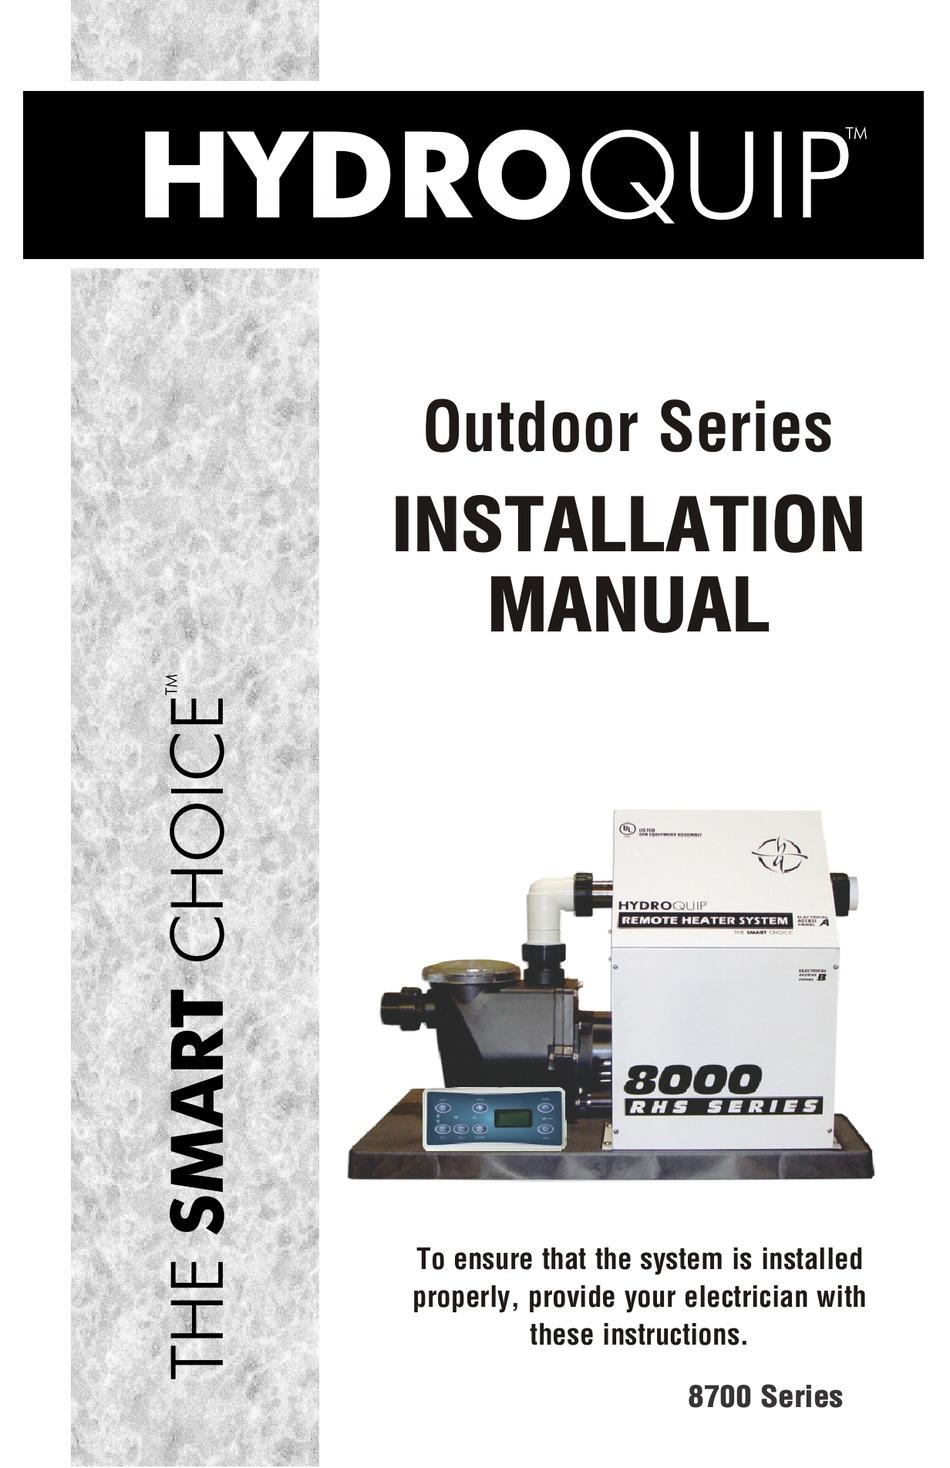 HYDROQUIP OUTDOOR SERIES INSTALLATION MANUAL Pdf Download   ManualsLib   Hydro Quip Heater Wiring Schematics      ManualsLib